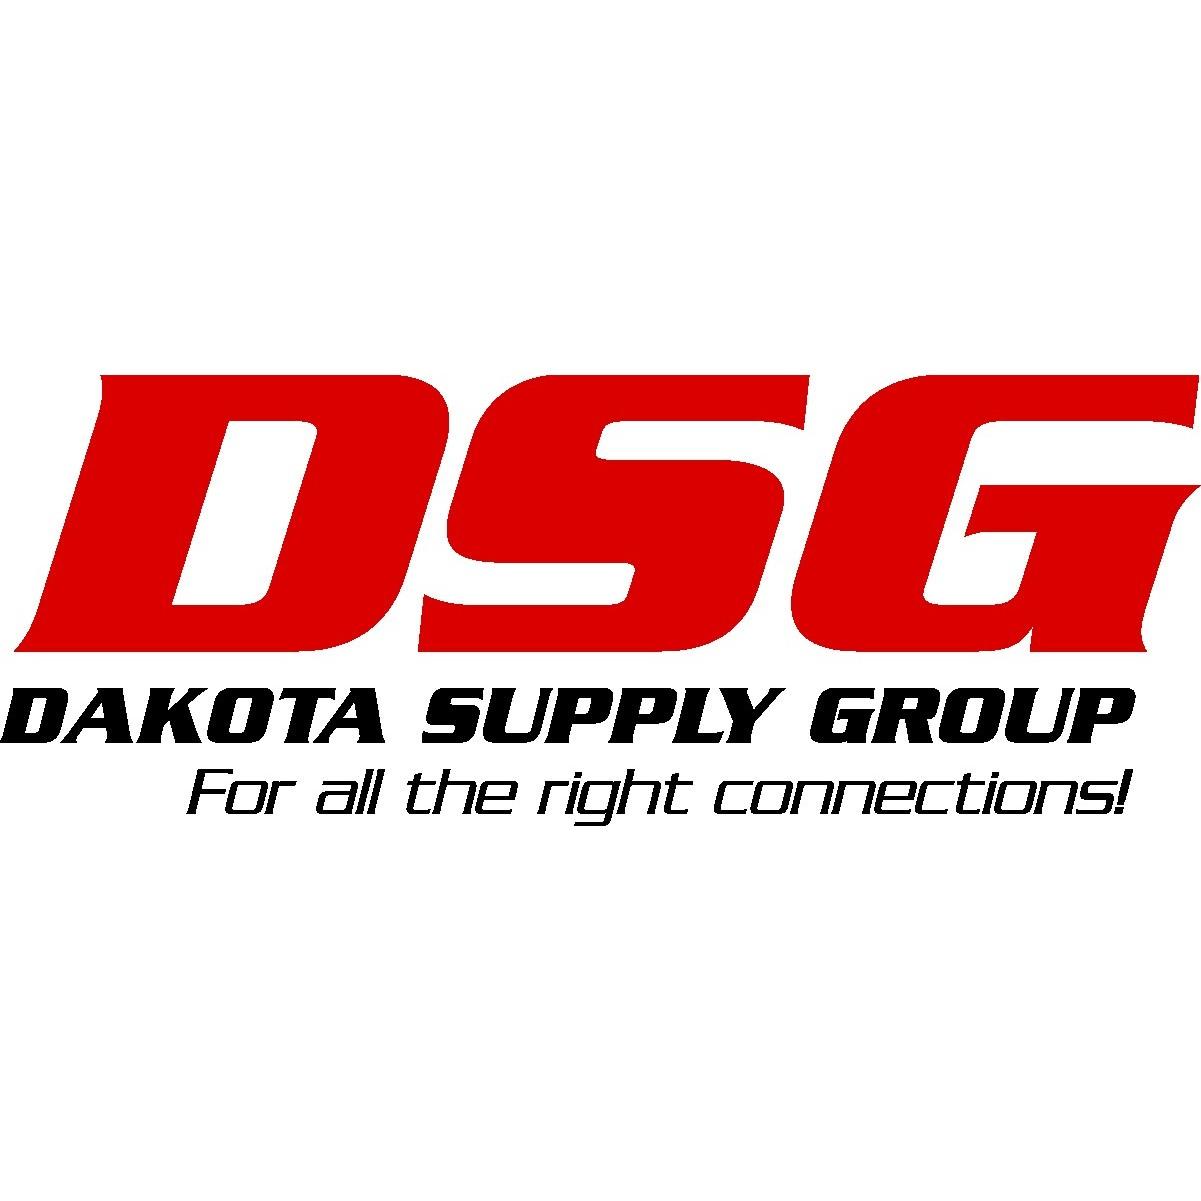 Dakota Supply Group